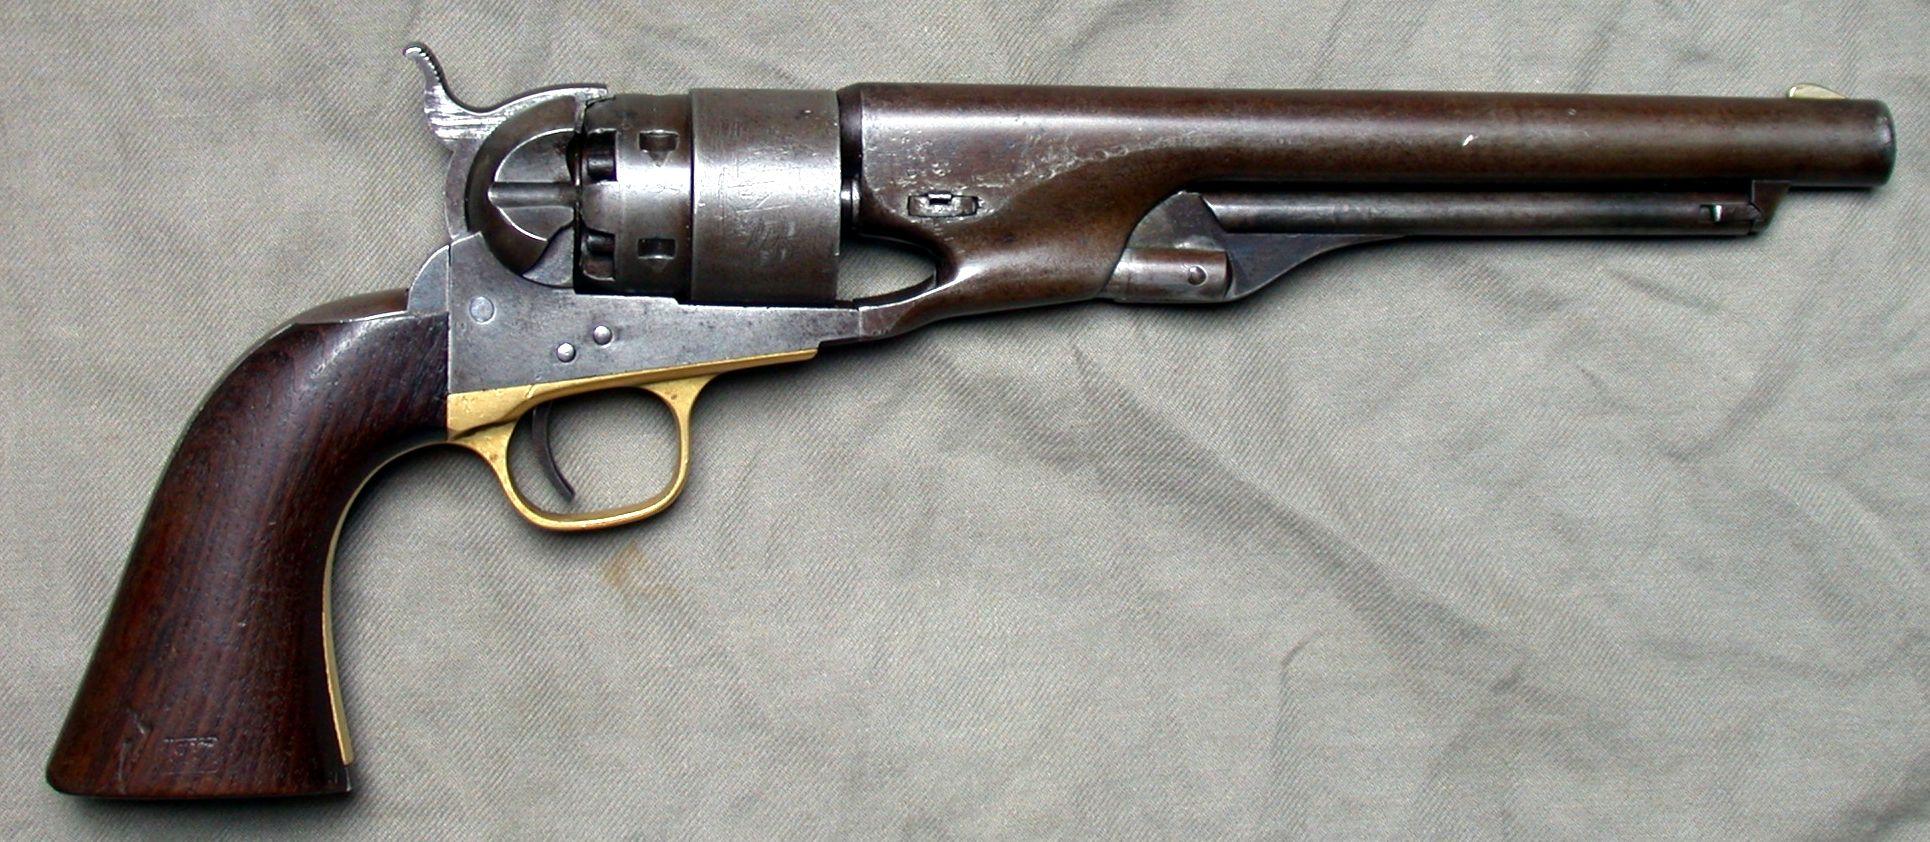 оружие m16 фото